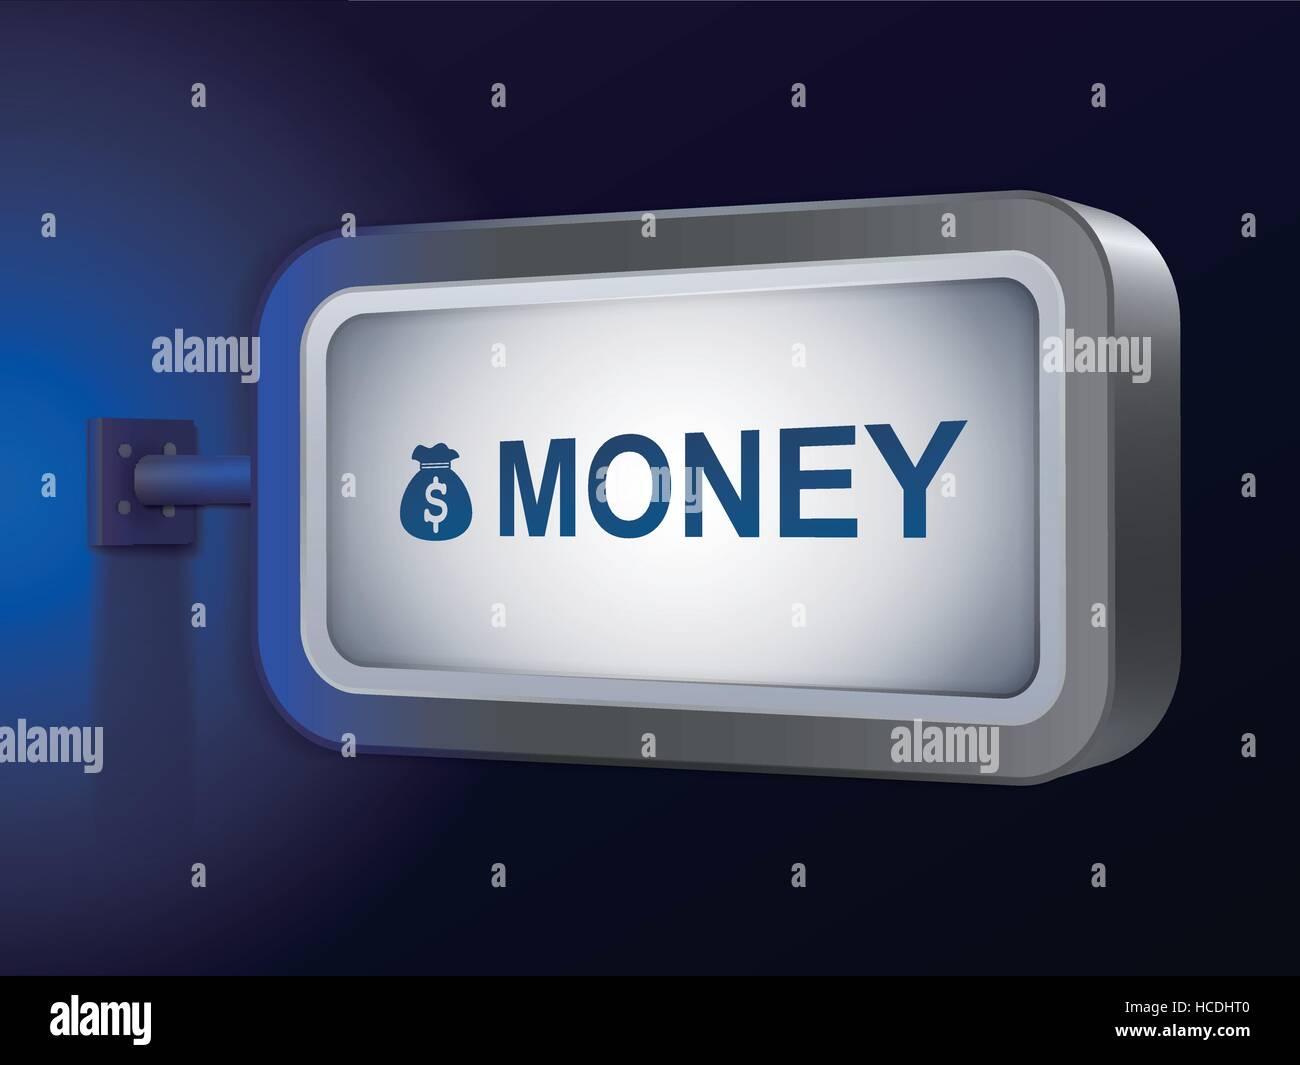 money word on billboard over blue background - Stock Image